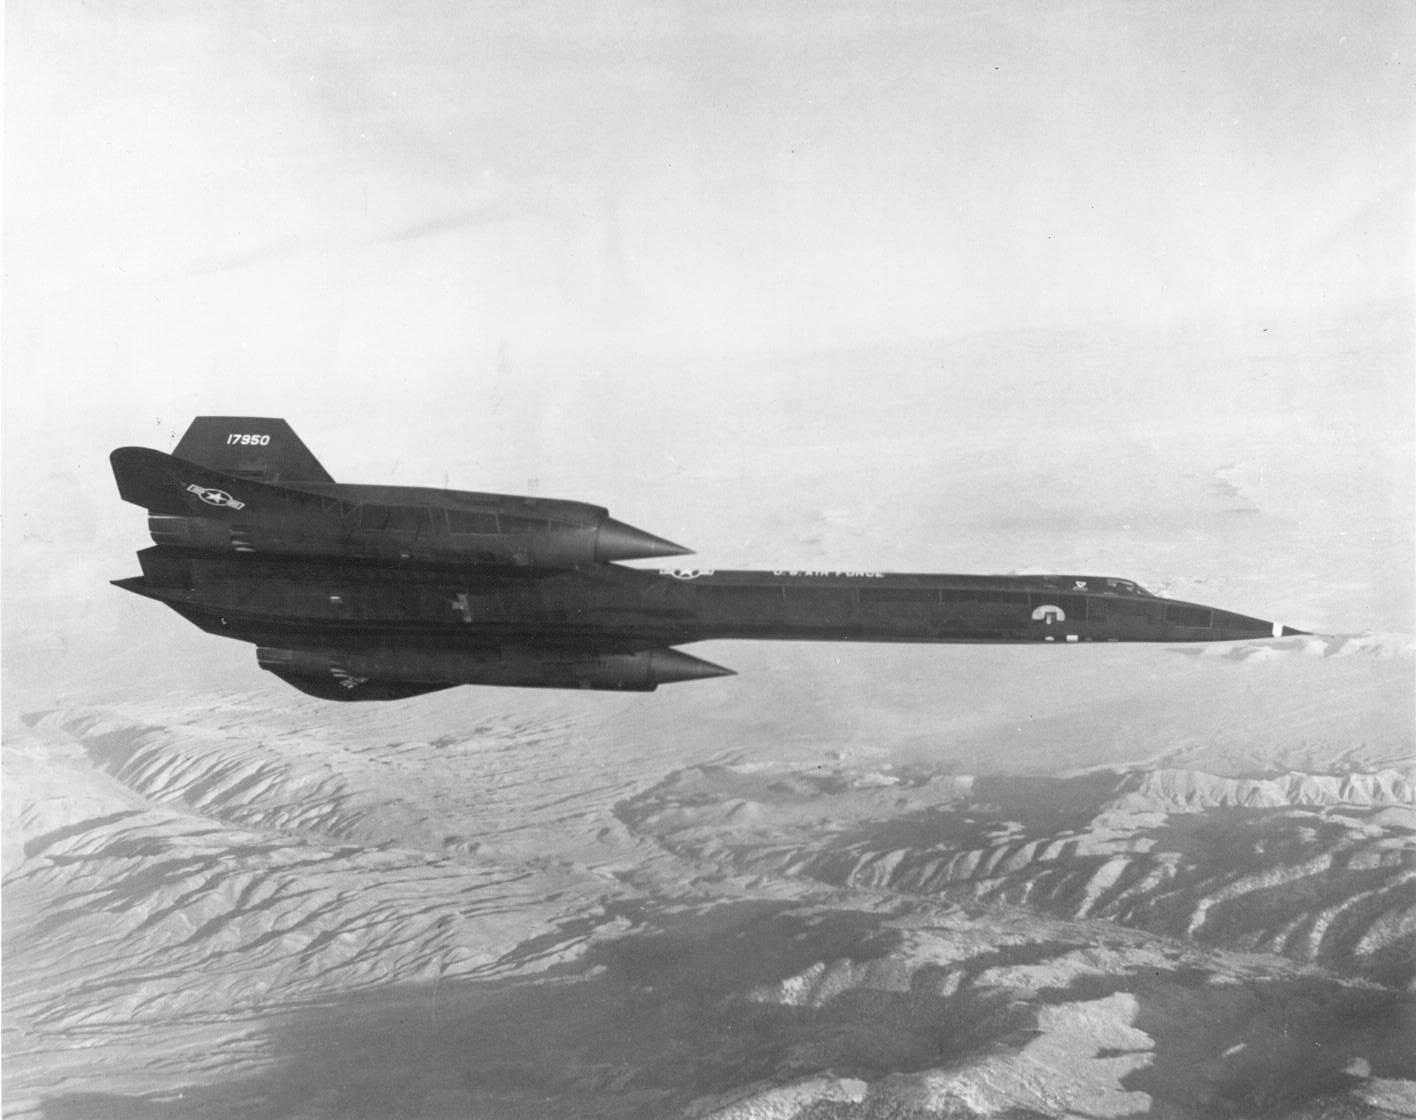 Lockheed SR-71A 61-7950 in flight. (U.S. Air Force)